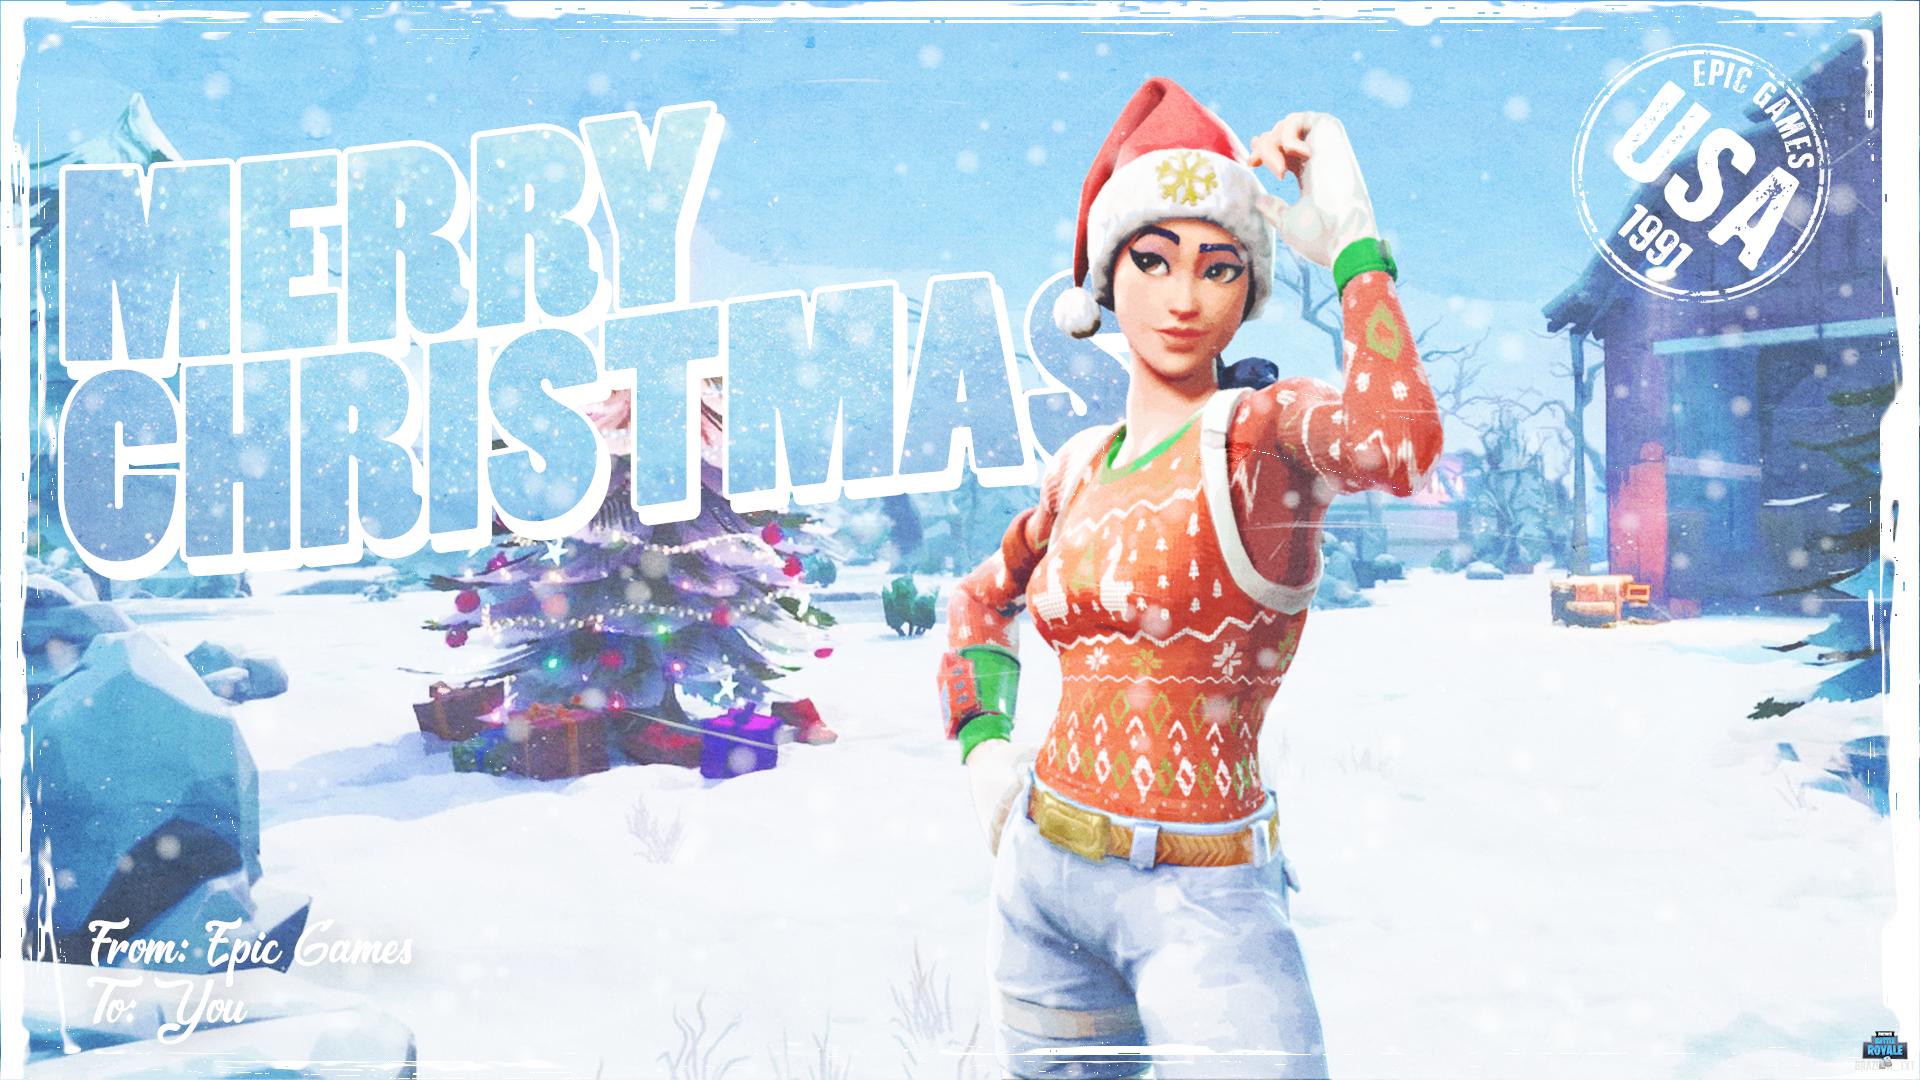 Its always Christmas in Fortnite 1080p Wallpaper FortNiteBR 1920x1080